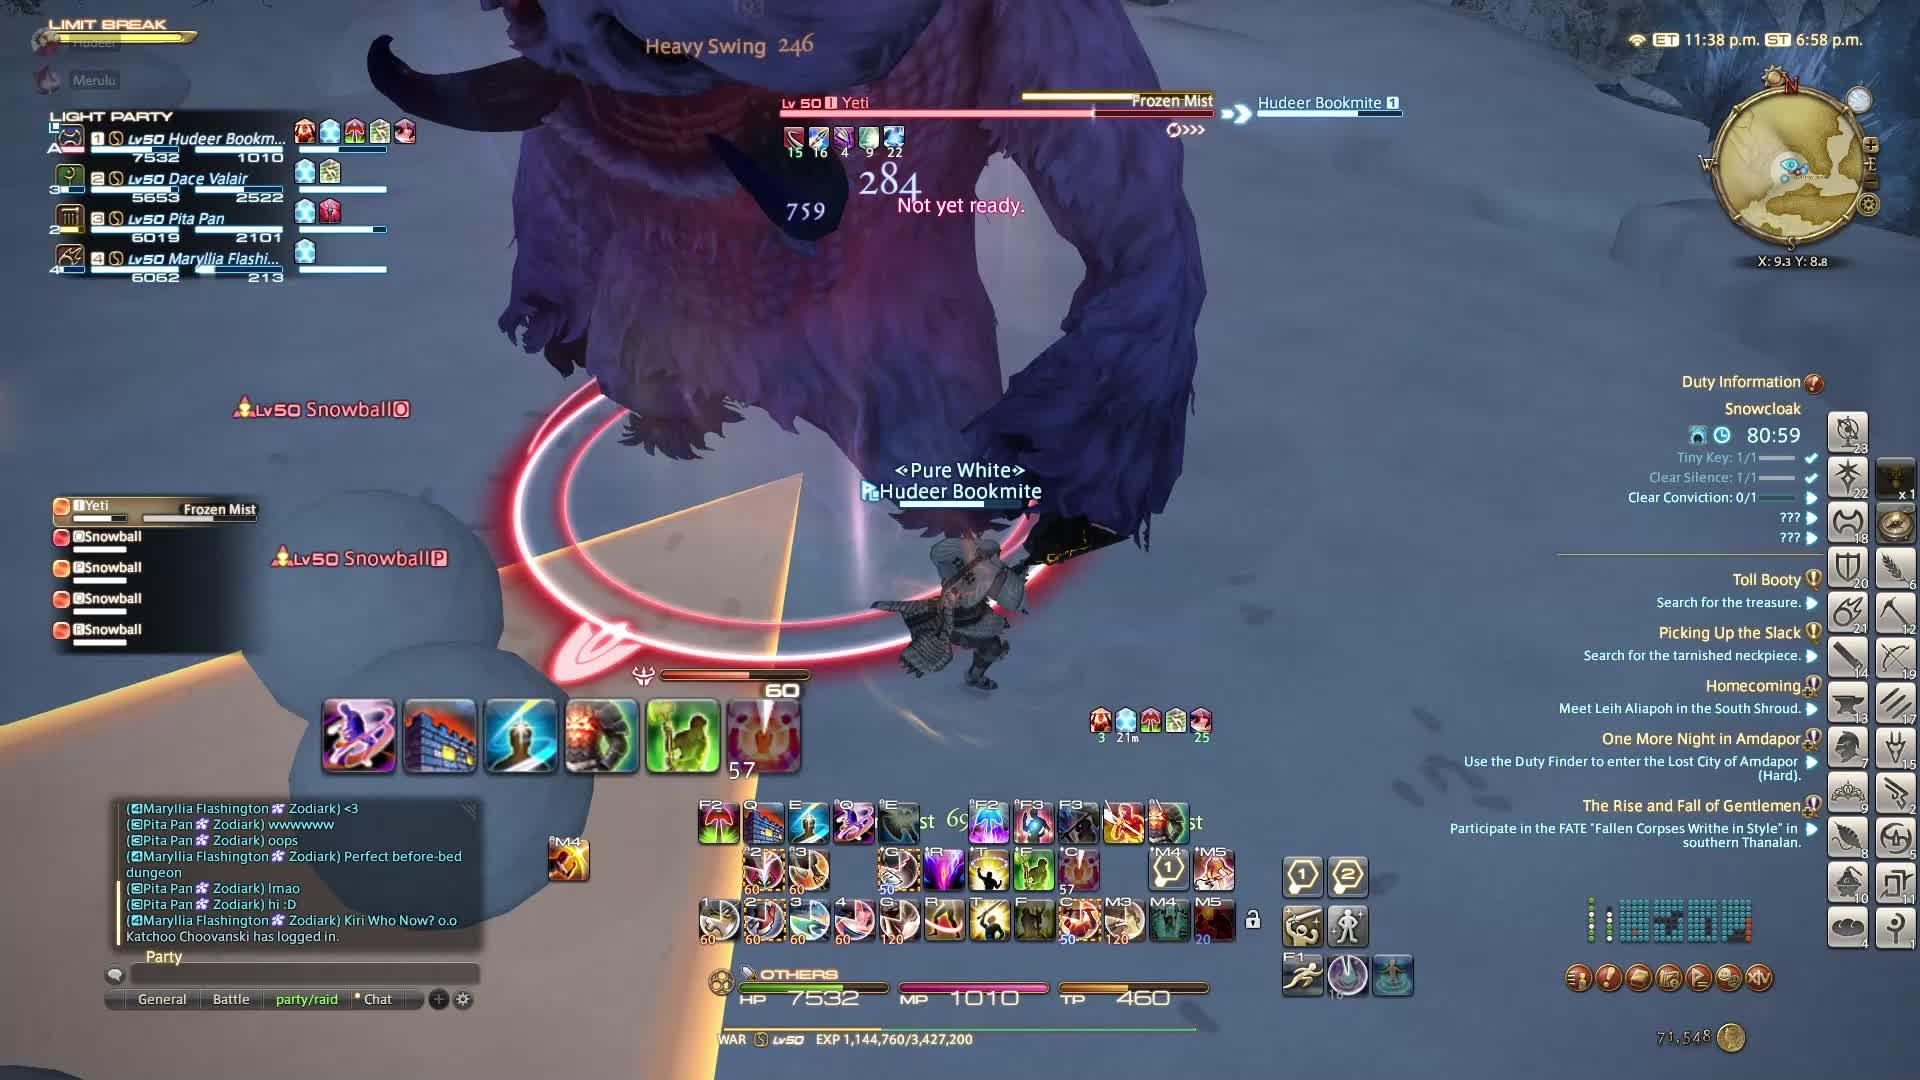 ffxiv, final fantasy 14, Strike! GIFs